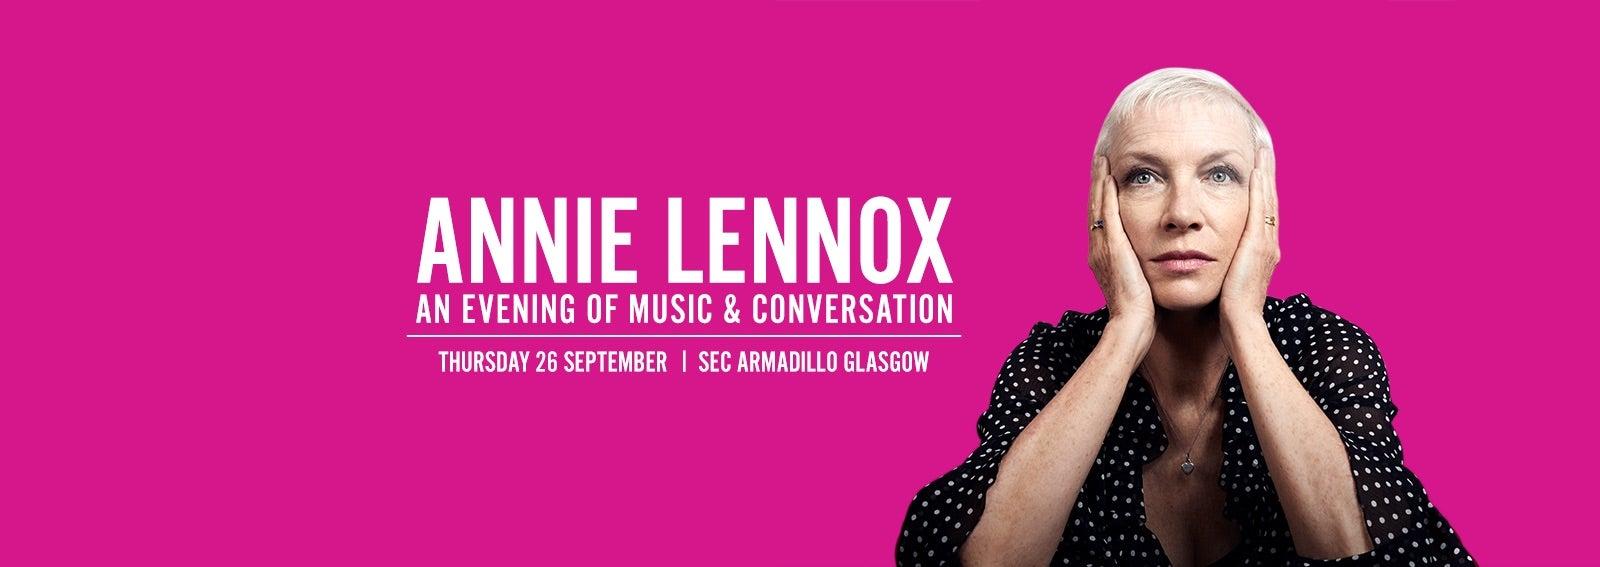 Annie-Lennox-Armadillo-2019-1600x567-Twitter-Cover.jpeg